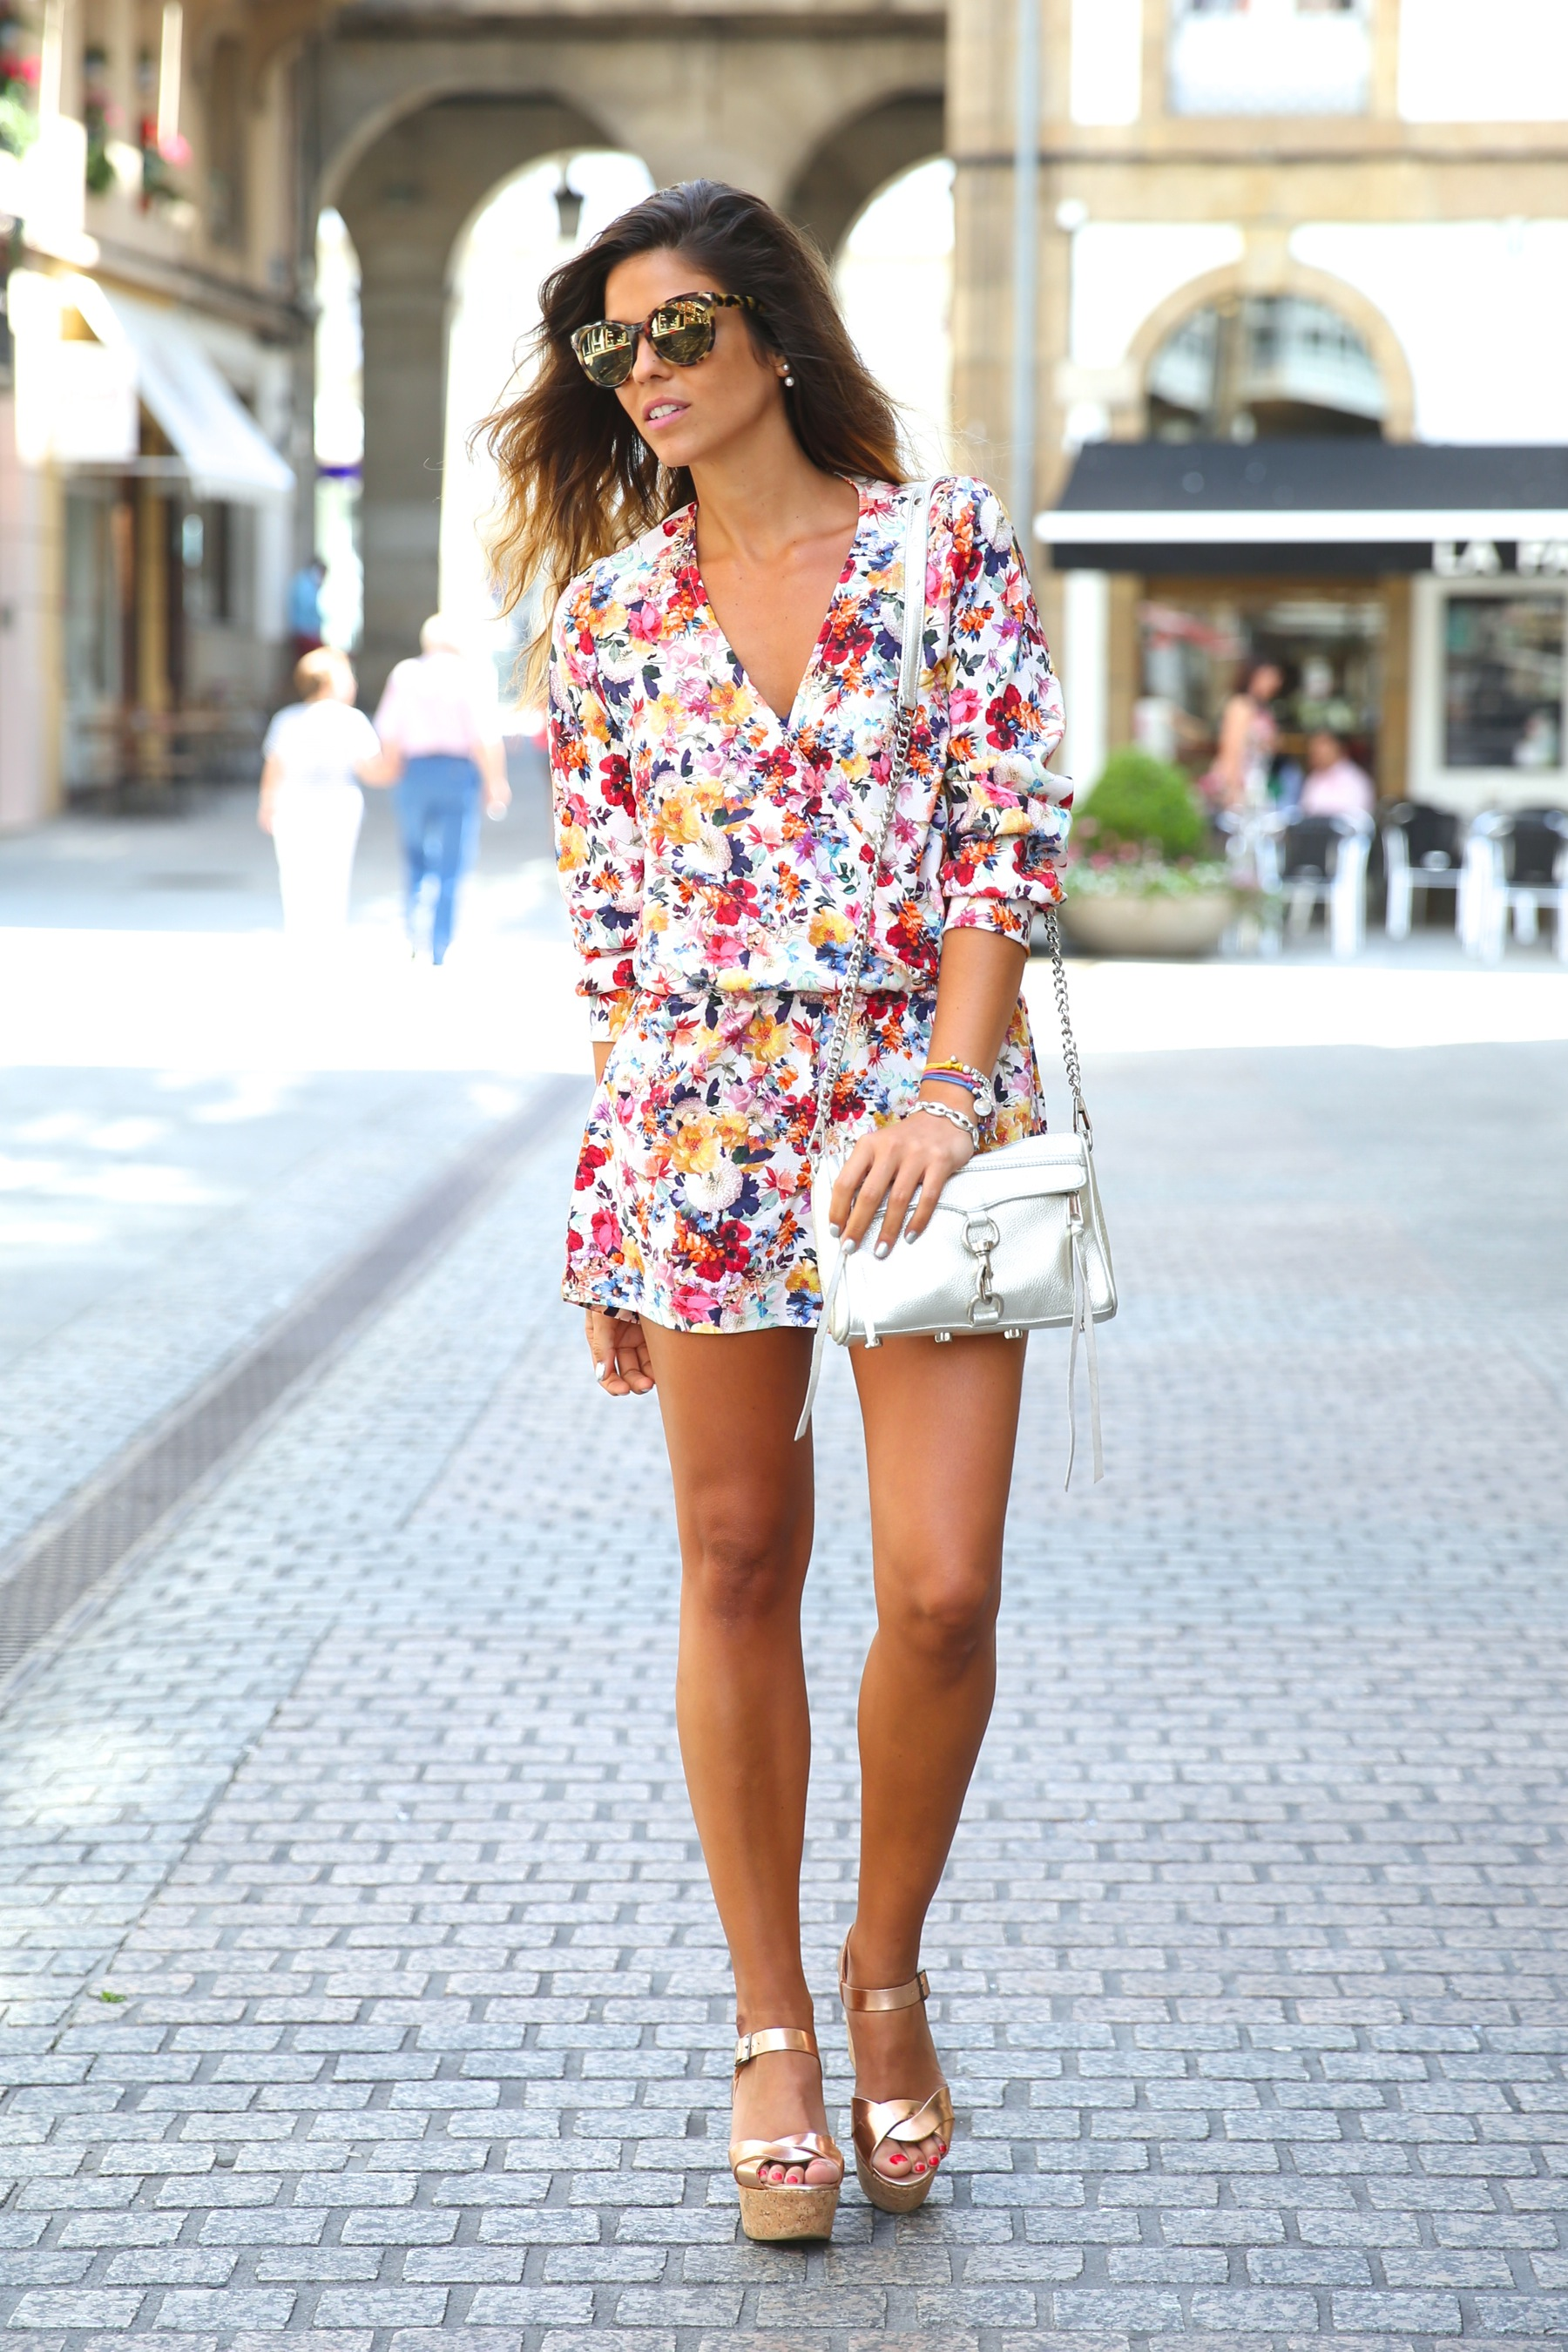 trendy_taste-look-outfit-street_style-ootd-blog-blogger-fashion_spain-moda_españa-mono-flores-flower_print-verano-summer-overall-la_coruña-9